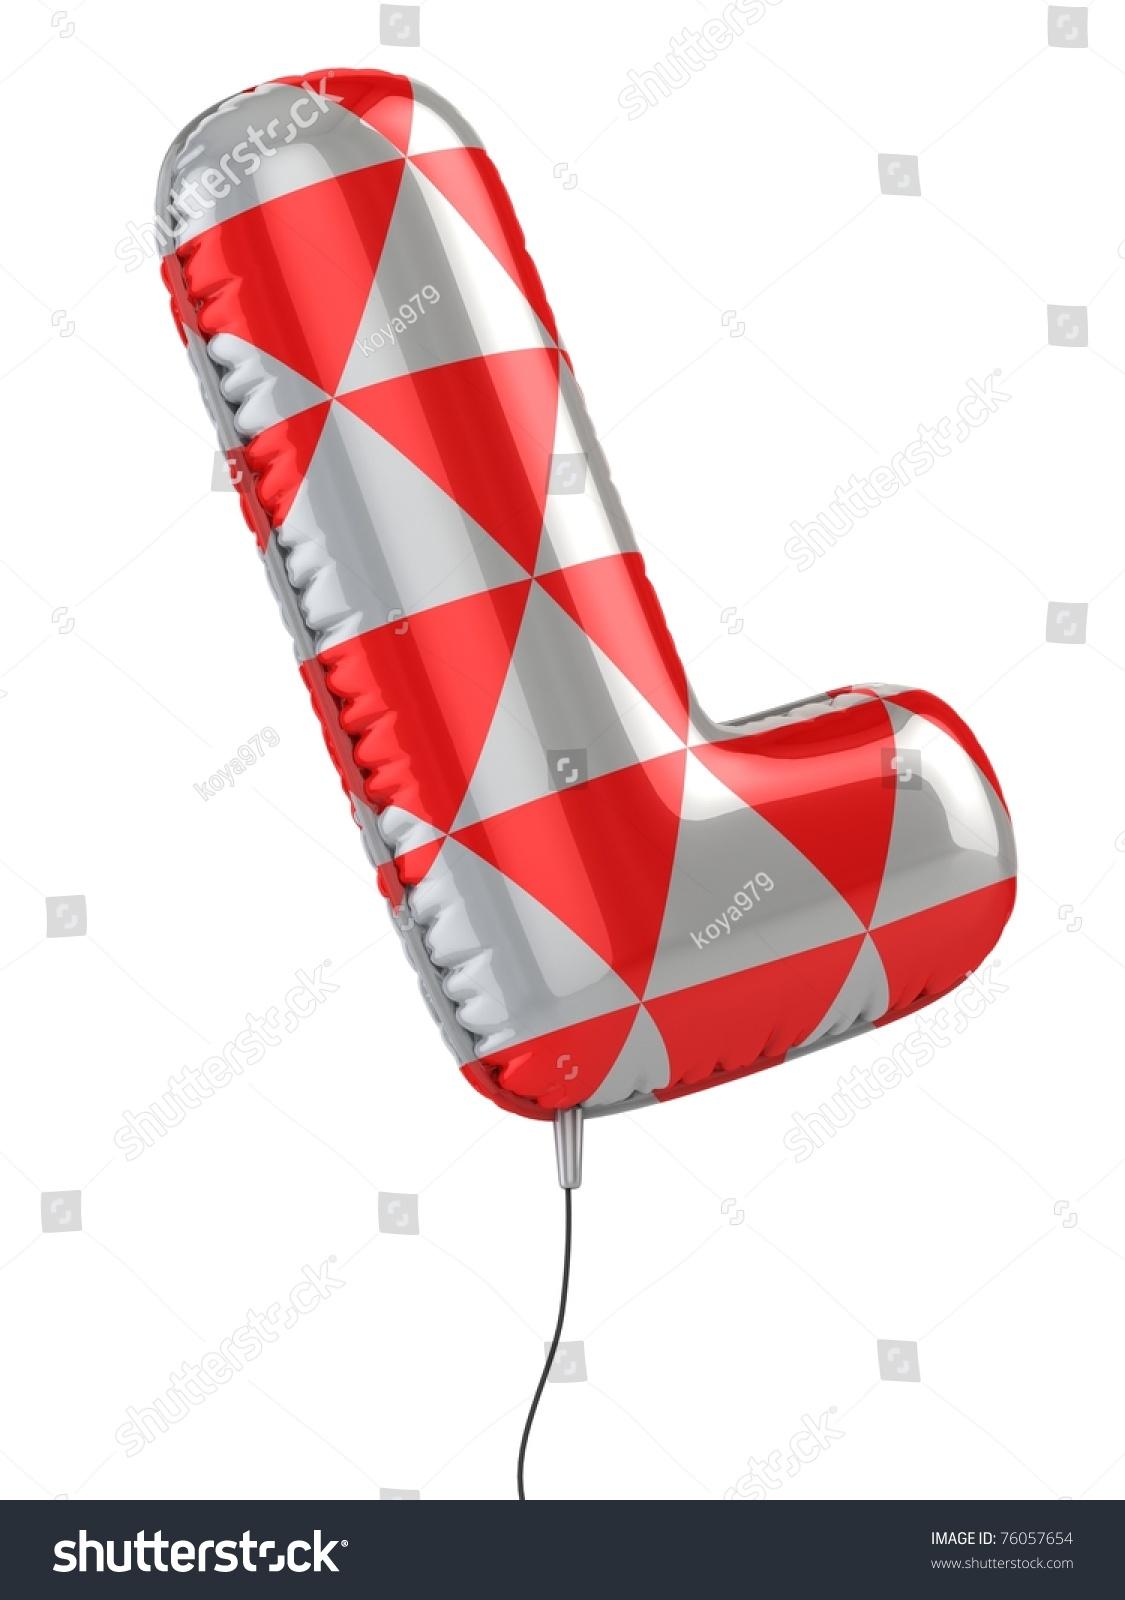 Letter L Balloon 3d Illustration